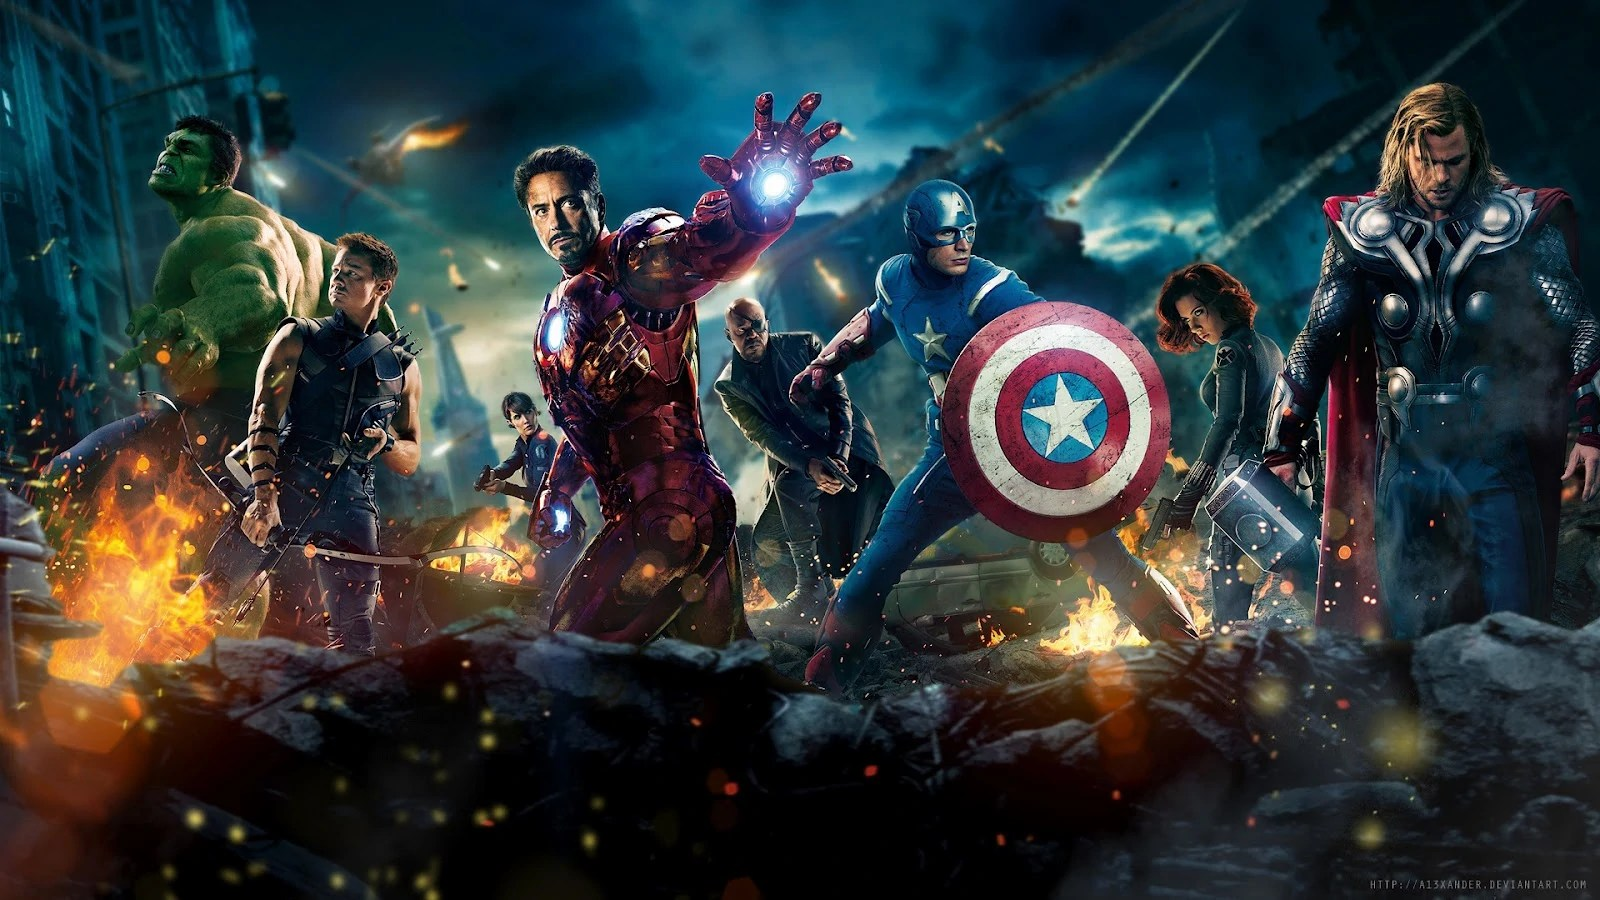 Image - Avengers-2012-full-hd-wallpaper-1920x1080-movie-1080p.jpg   Disney Wiki   FANDOM powered ...